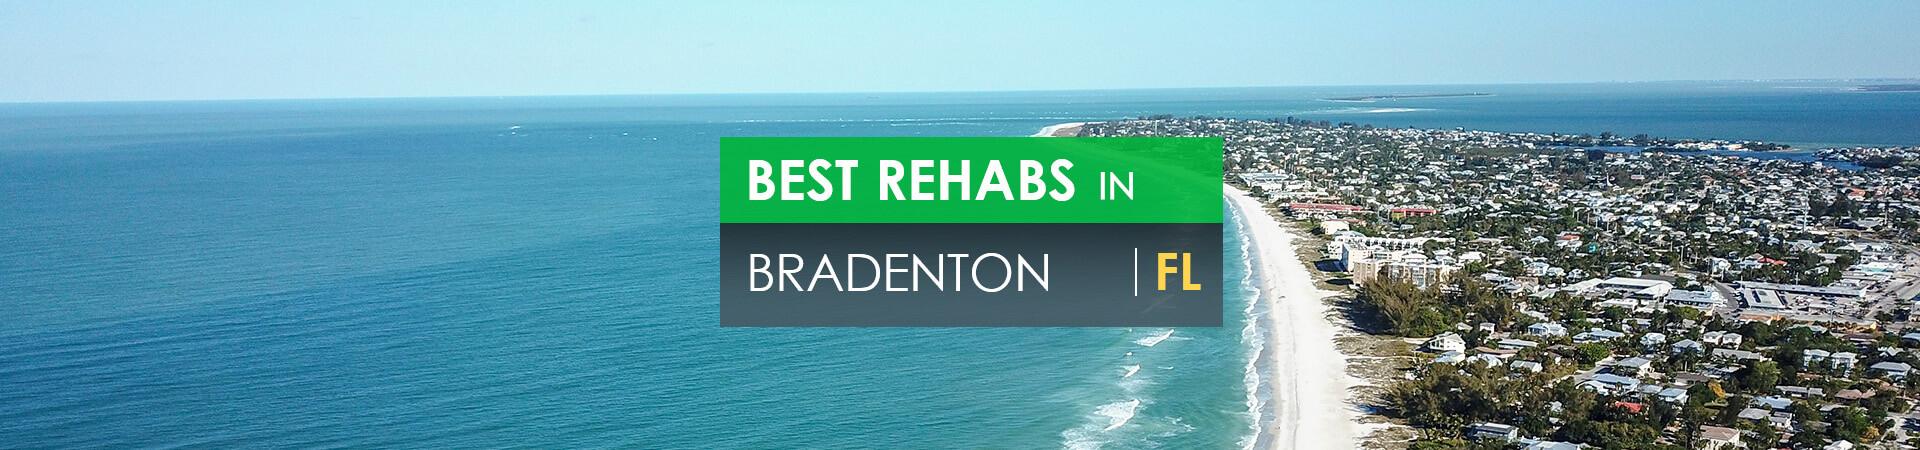 Best rehabs in Bradenton, FL